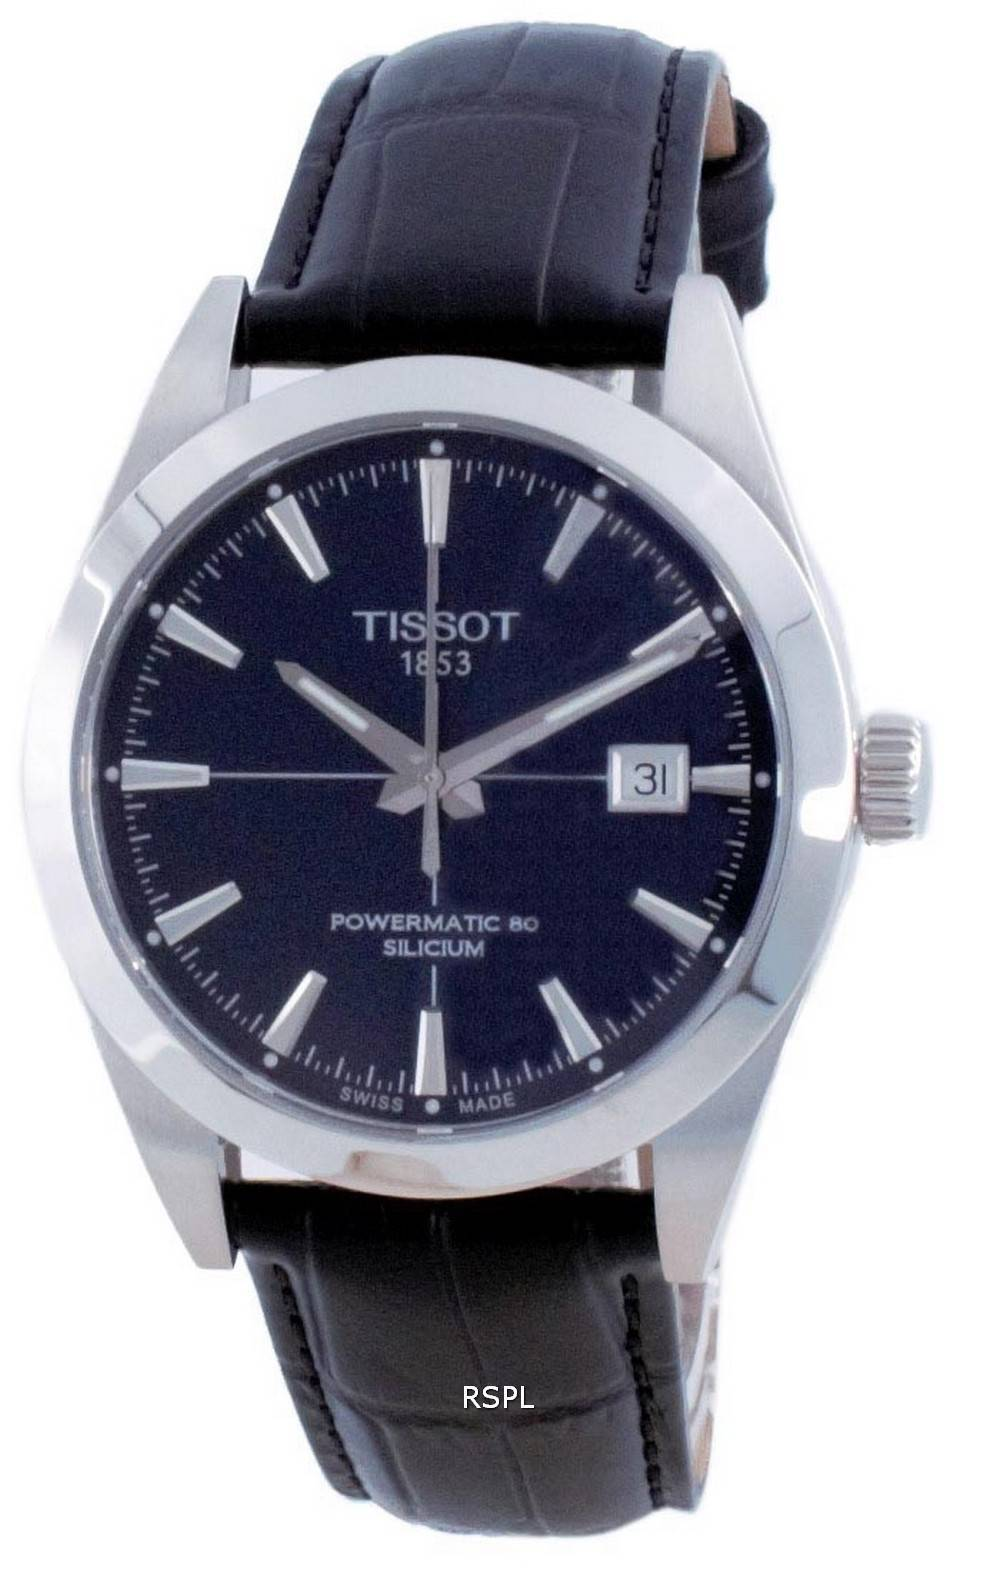 Tissot T-Classic Gentleman Powermatic 80 Silicium Automatic T127.407.16.041.01 T1274071604101 100M miesten kello